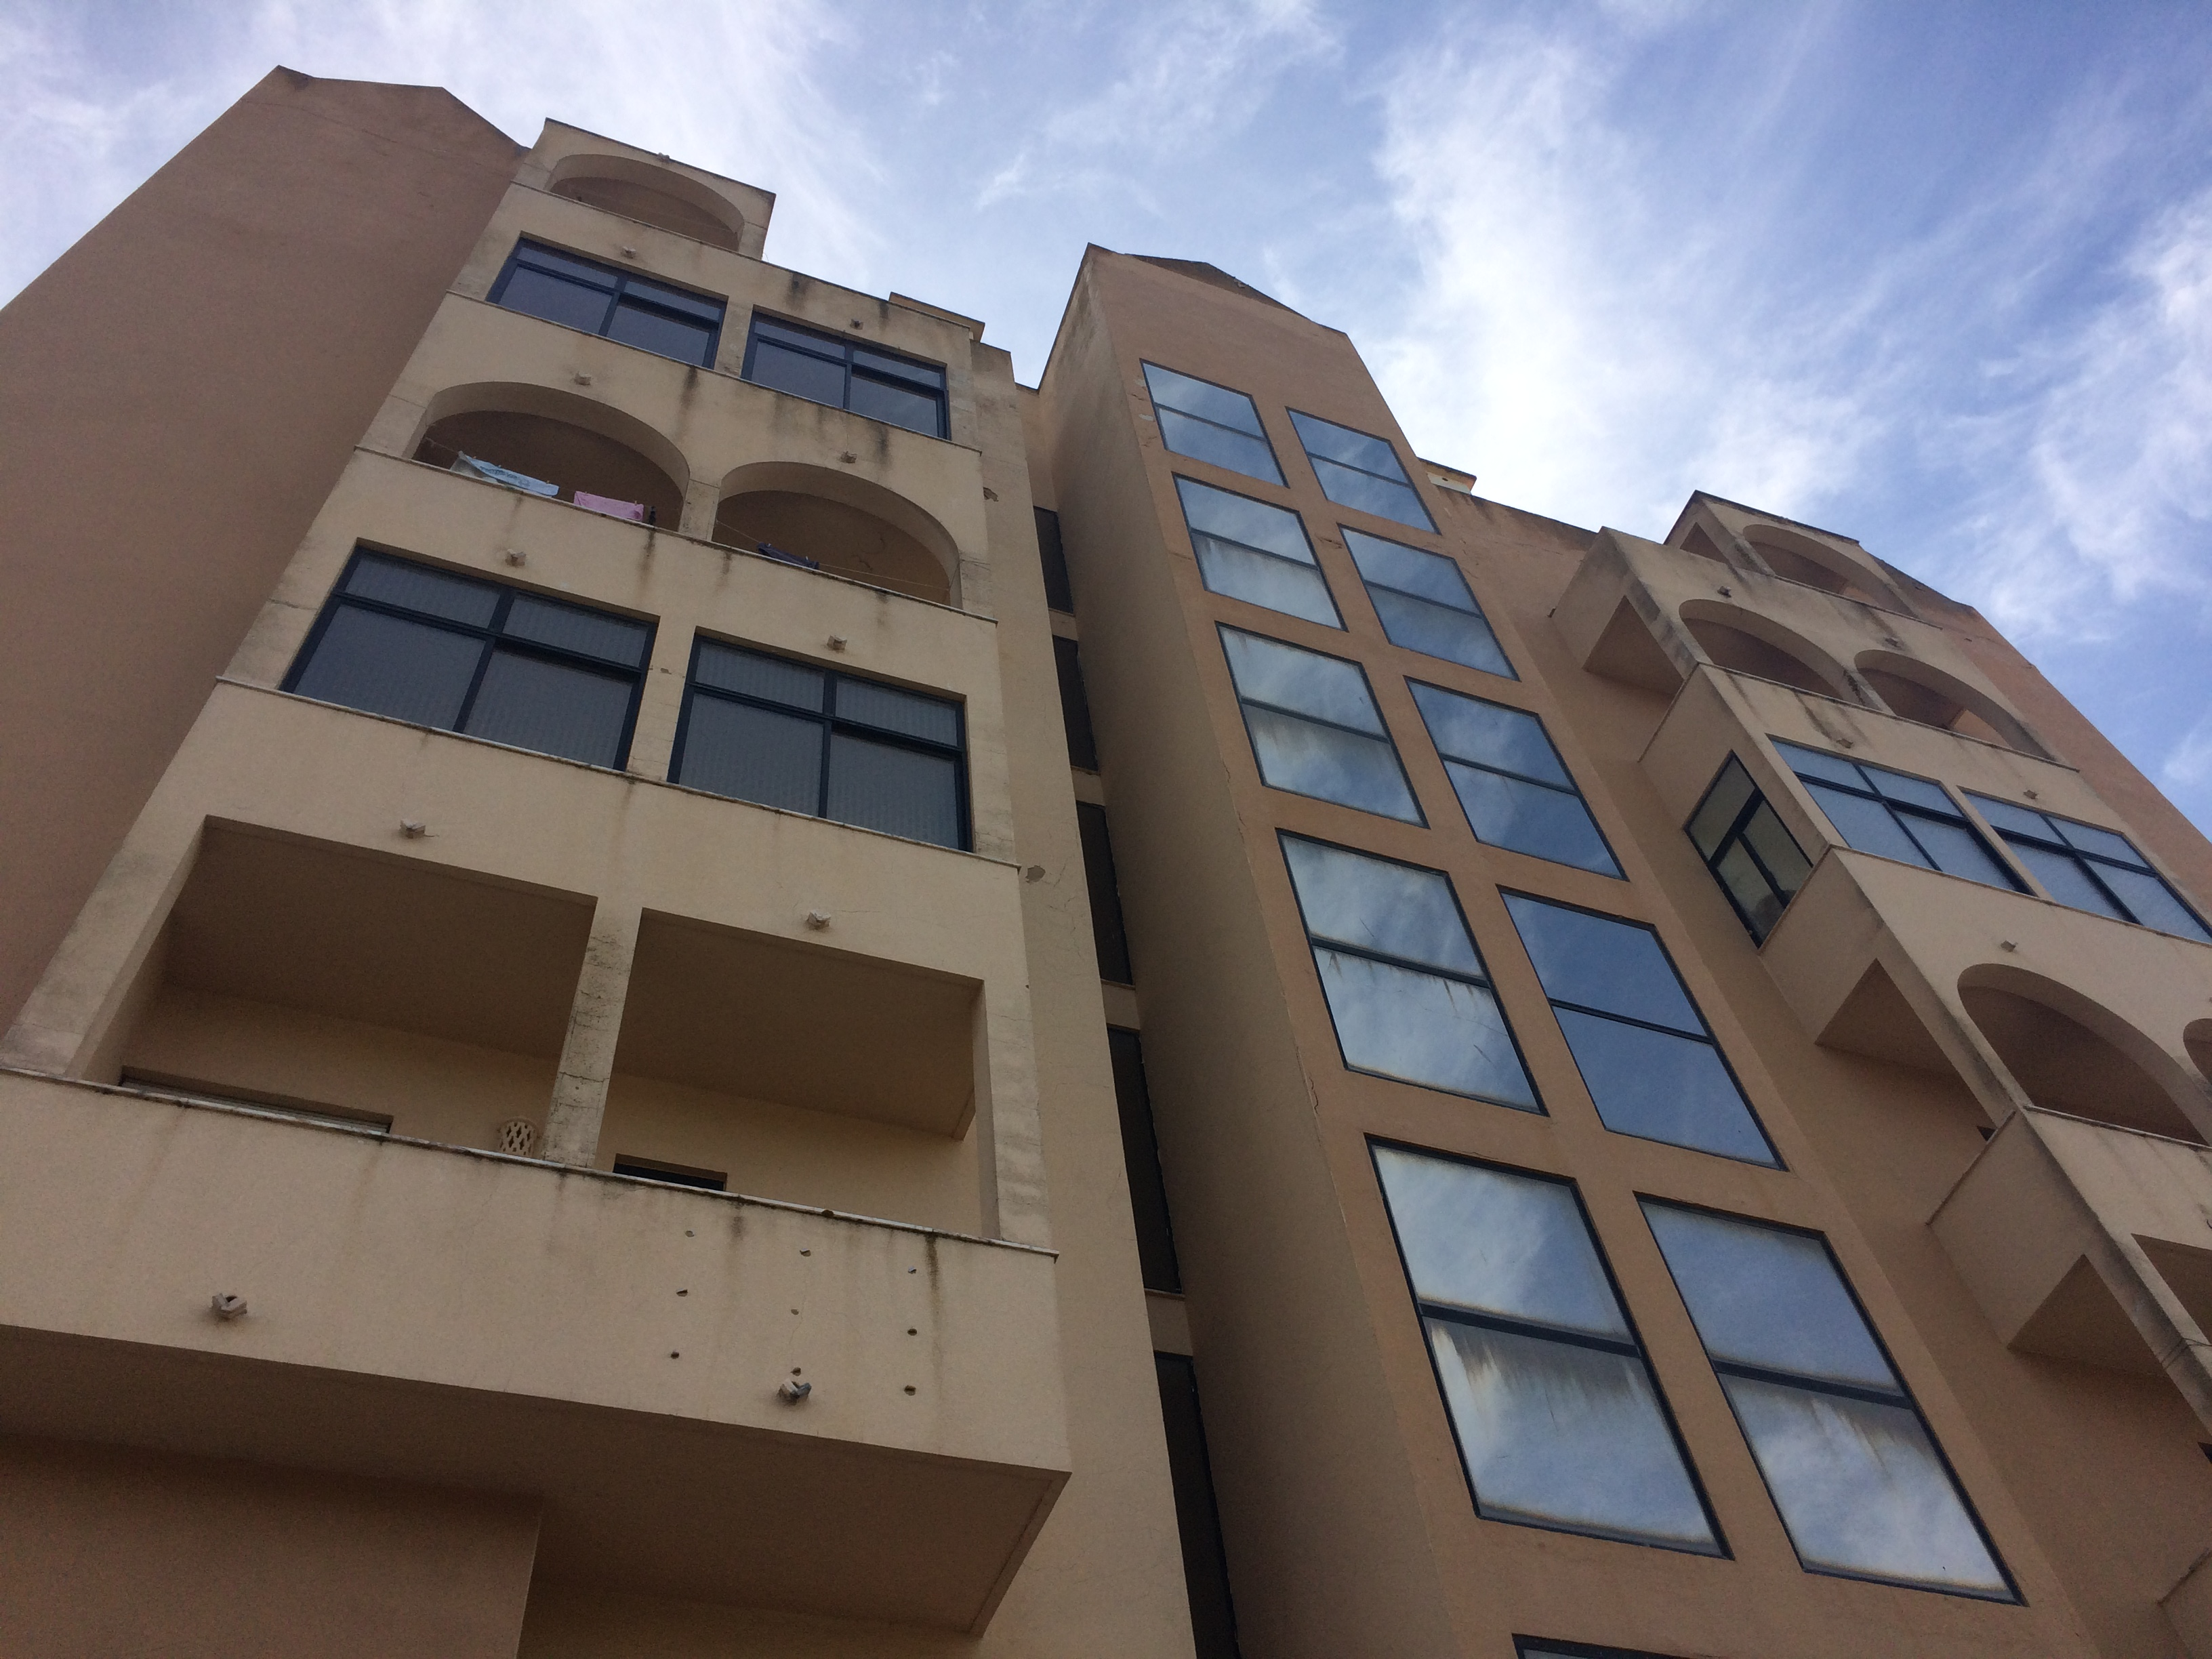 Location appartements et villas de vacance, ROCHA PATIO – T1 BEACH APARTMENT - PORTIMÃO à Portimão, Portugal Algarve, REF_IMG_205_5294